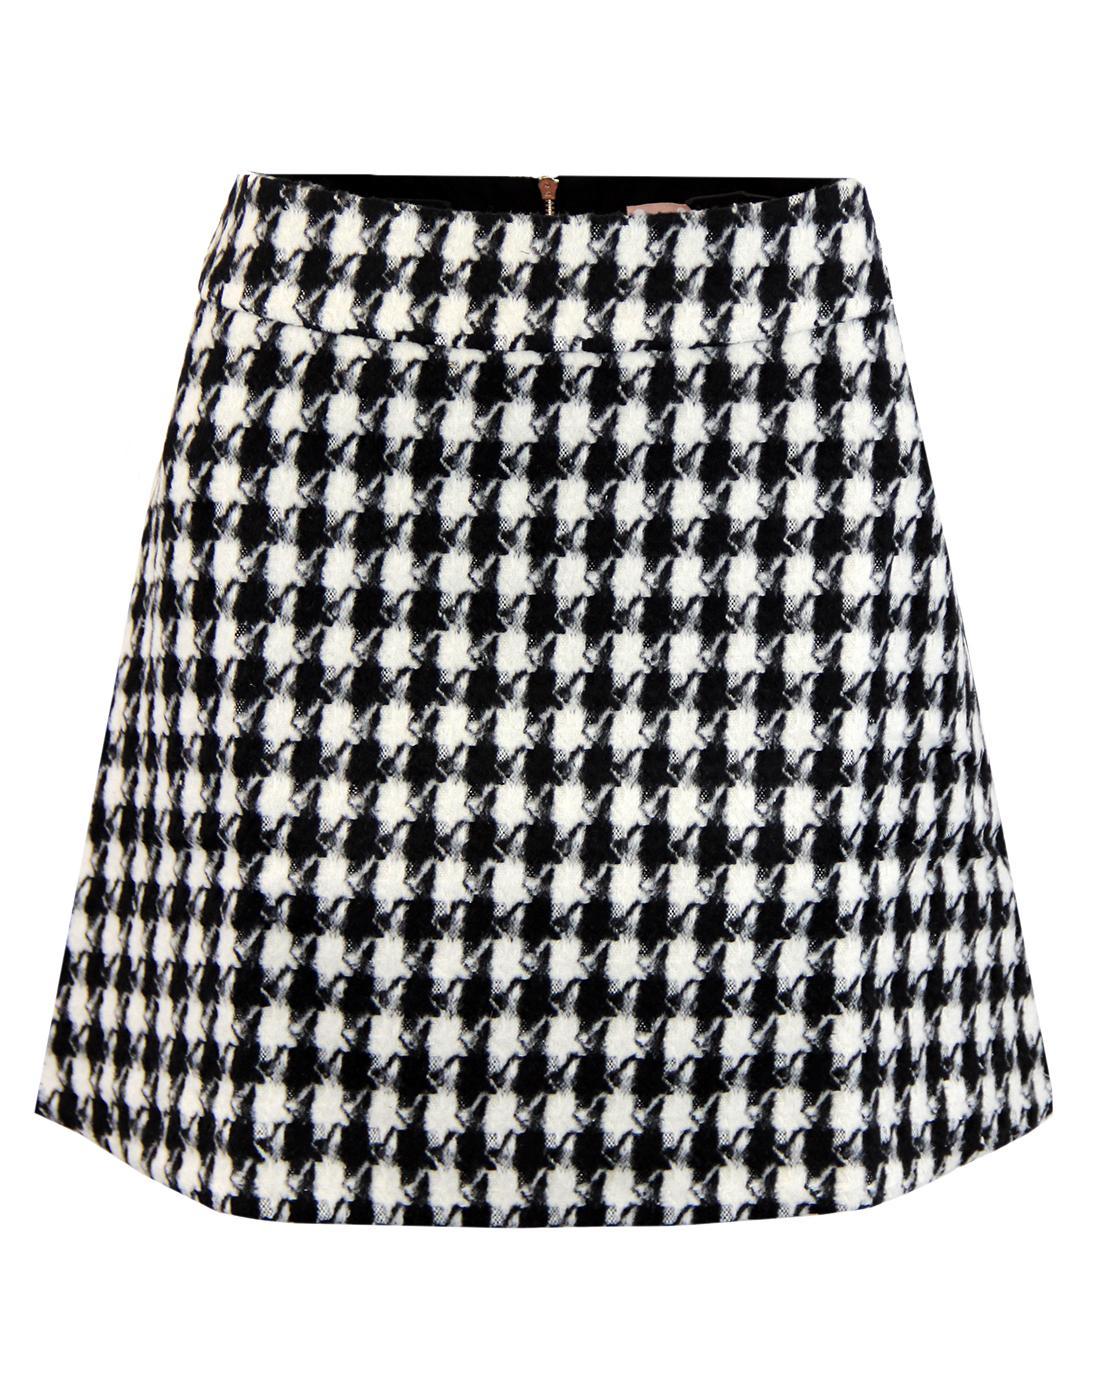 TRAFFIC PEOPLE Retro 60s Mod Dogtooth Mini Skirt